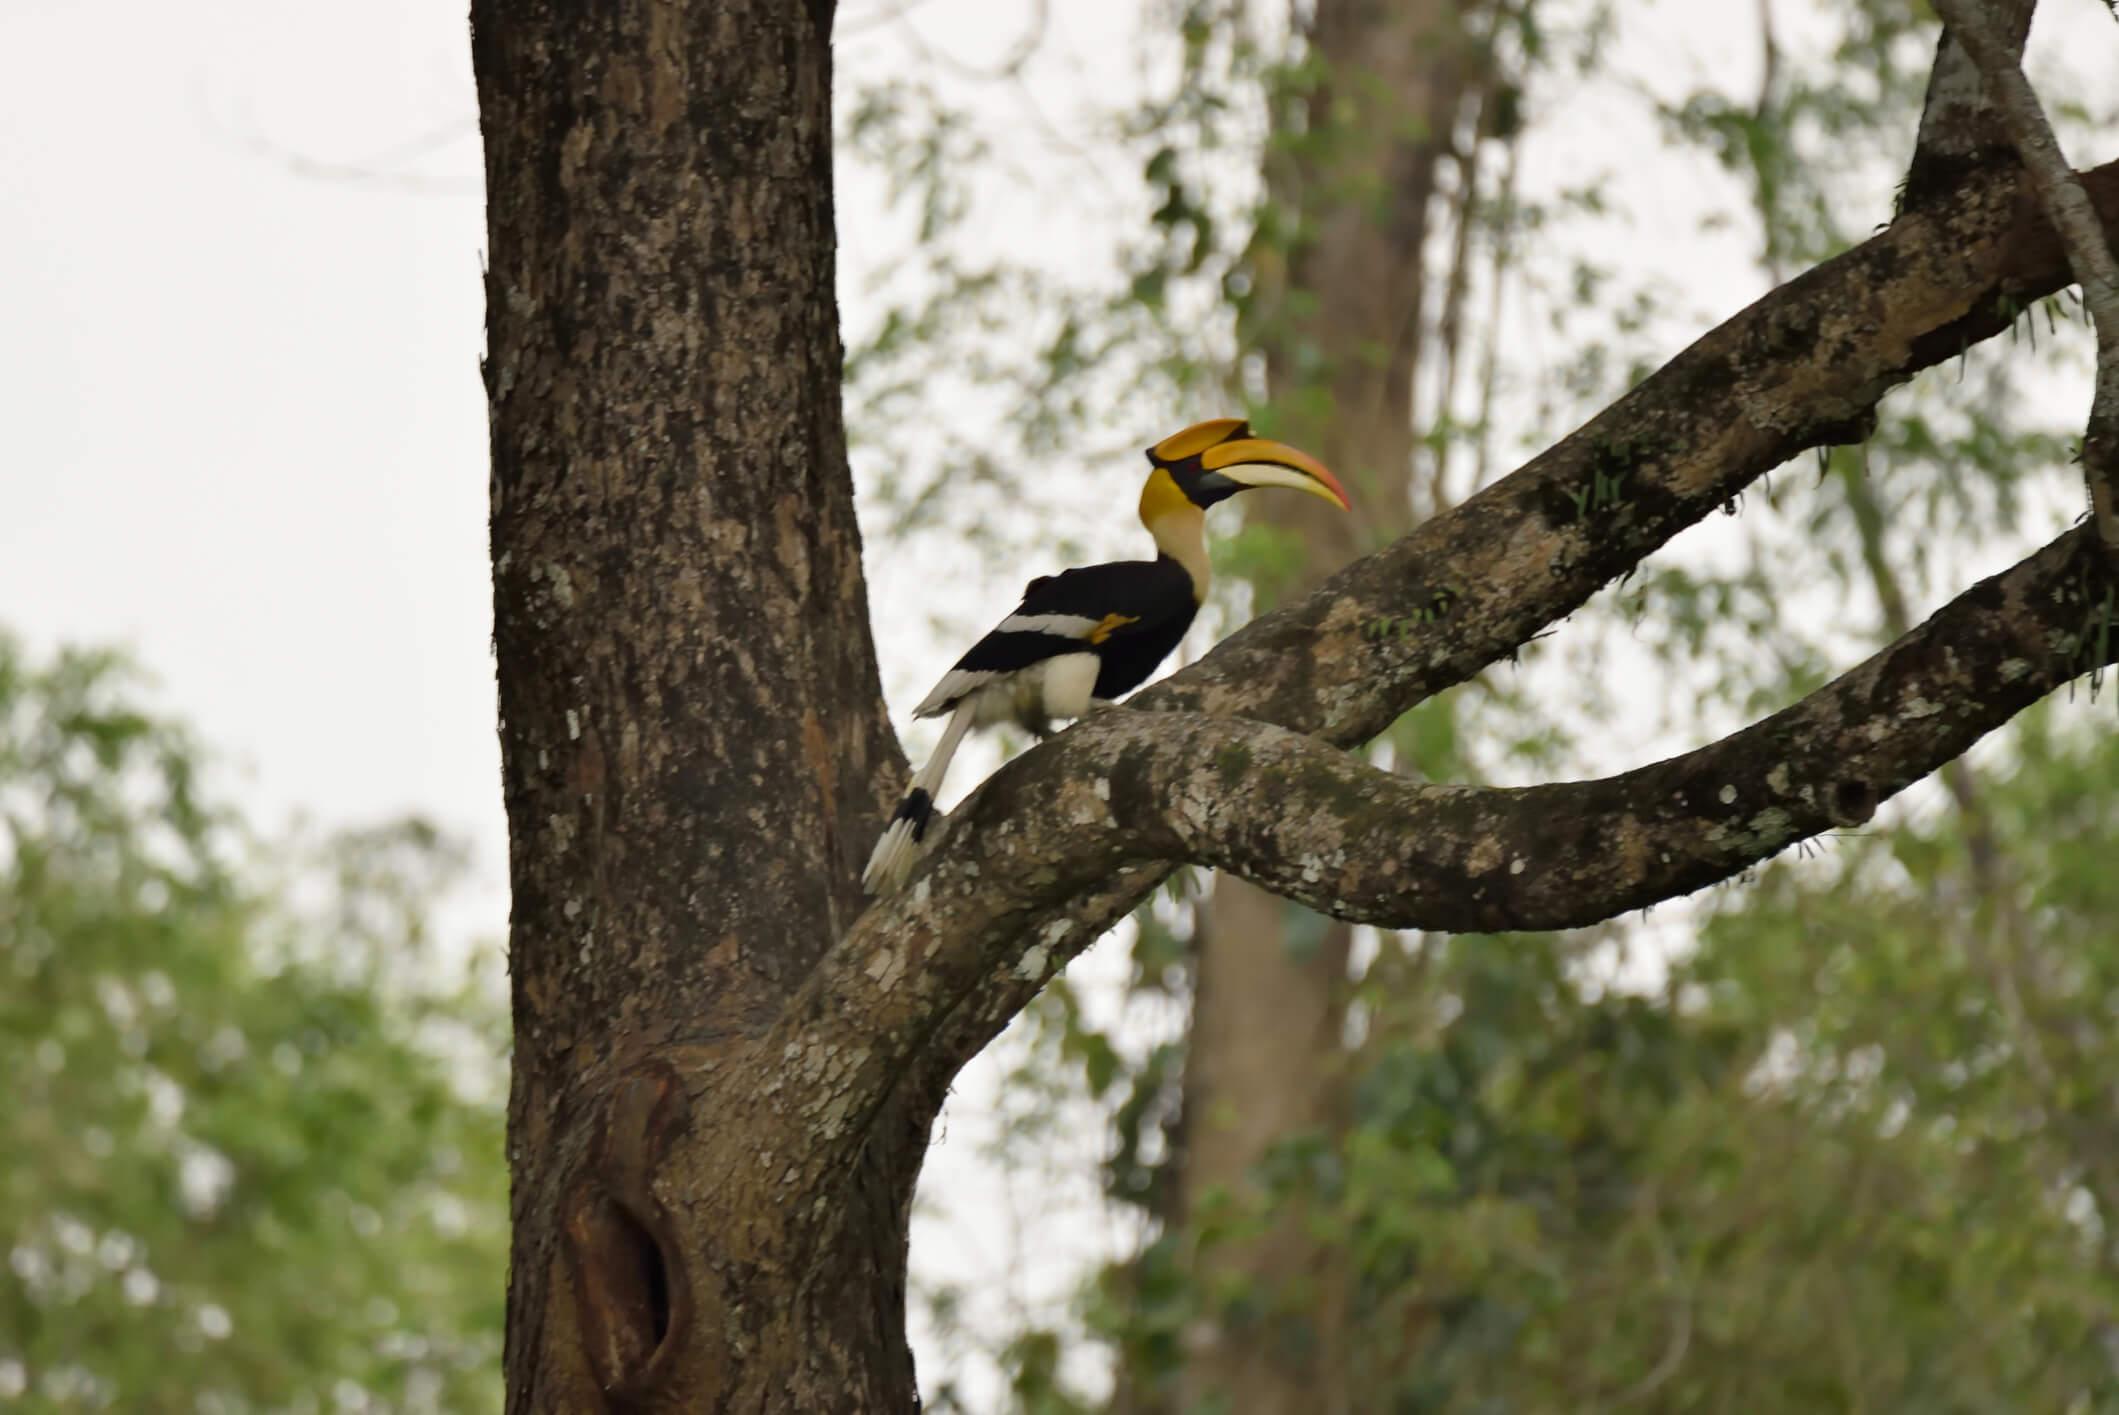 A Great Hornbill perched on a tree in Assam - Assam tourism